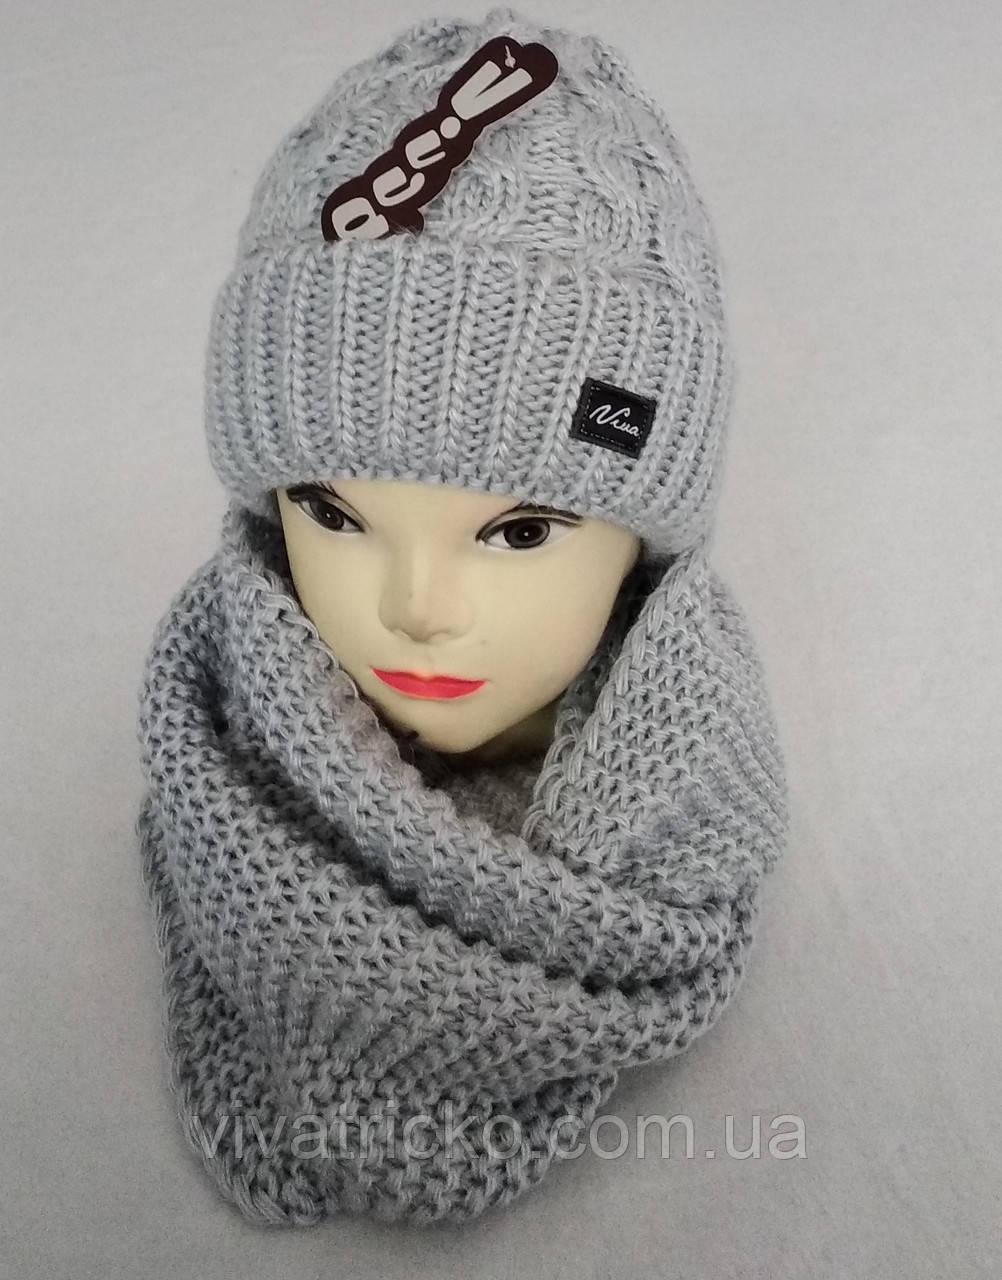 М 5065 Комплект женский шапка+хомут, марс, флис